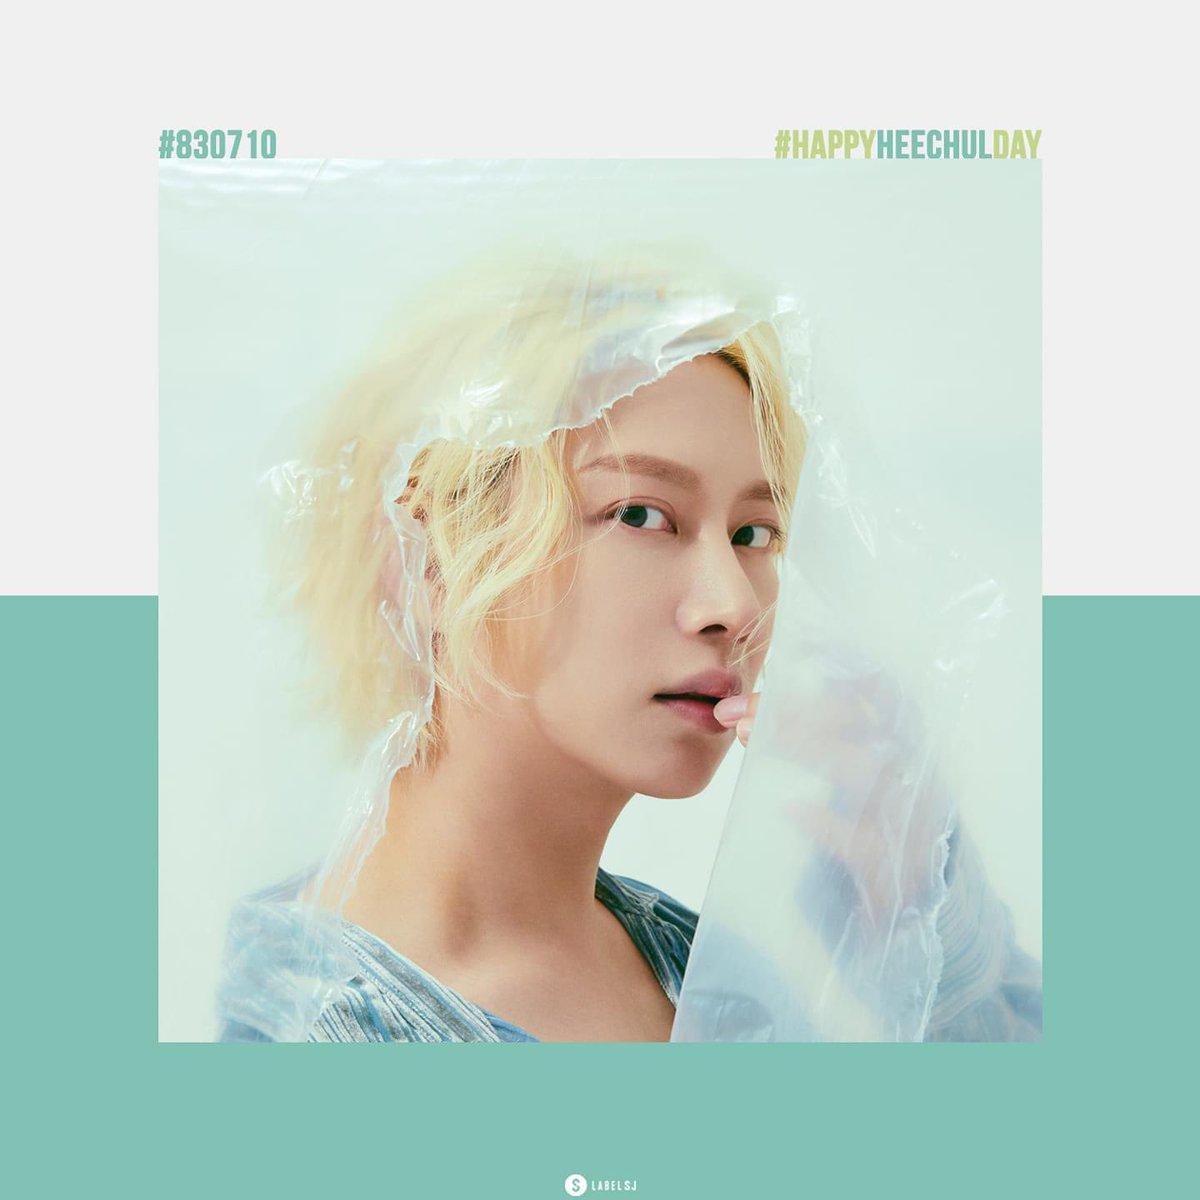 Happy Heechul Day July 10, 1983 #KimHeechul #superjunior #elf #Donghae #Eunhyuk #Leeteuk #Kyuhyun #Ryeowook #Siwon #Sungmin #Yesung #Shindong #kpop #idol #bias #rap #singer #happyHeechulday https://t.co/cWmyu8voTc